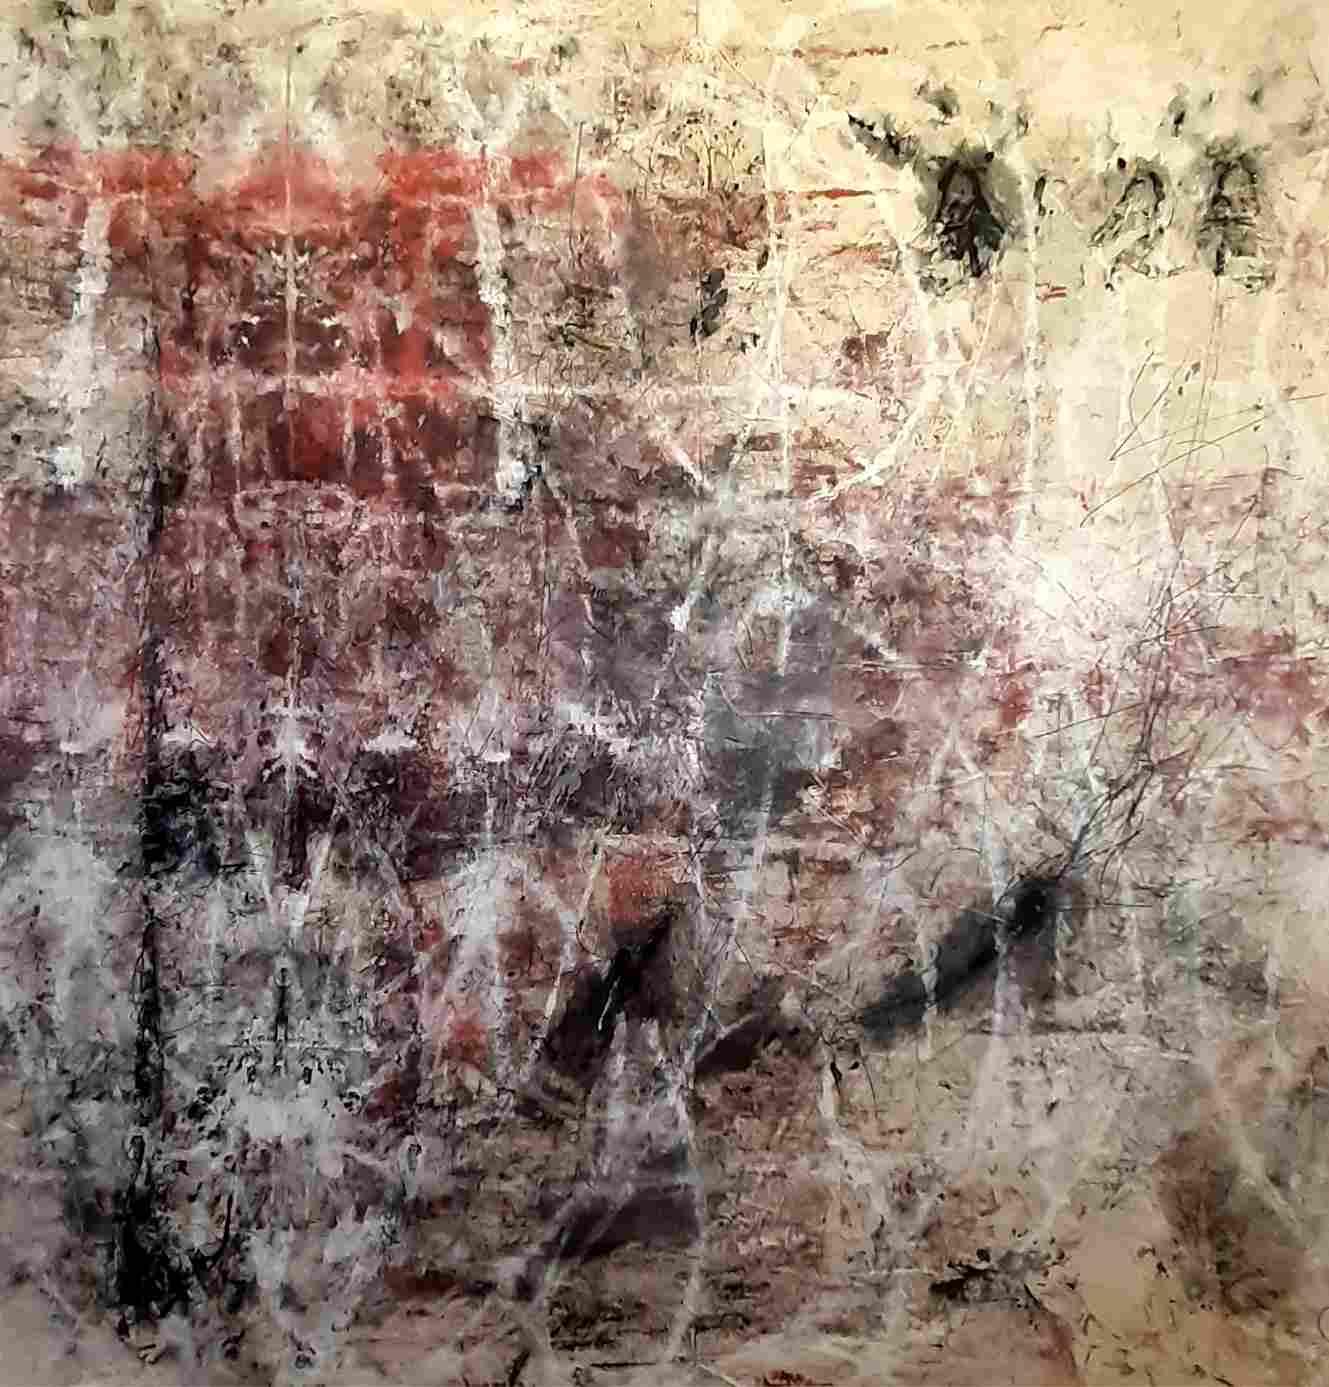 Cores na neblina por Alex Sena